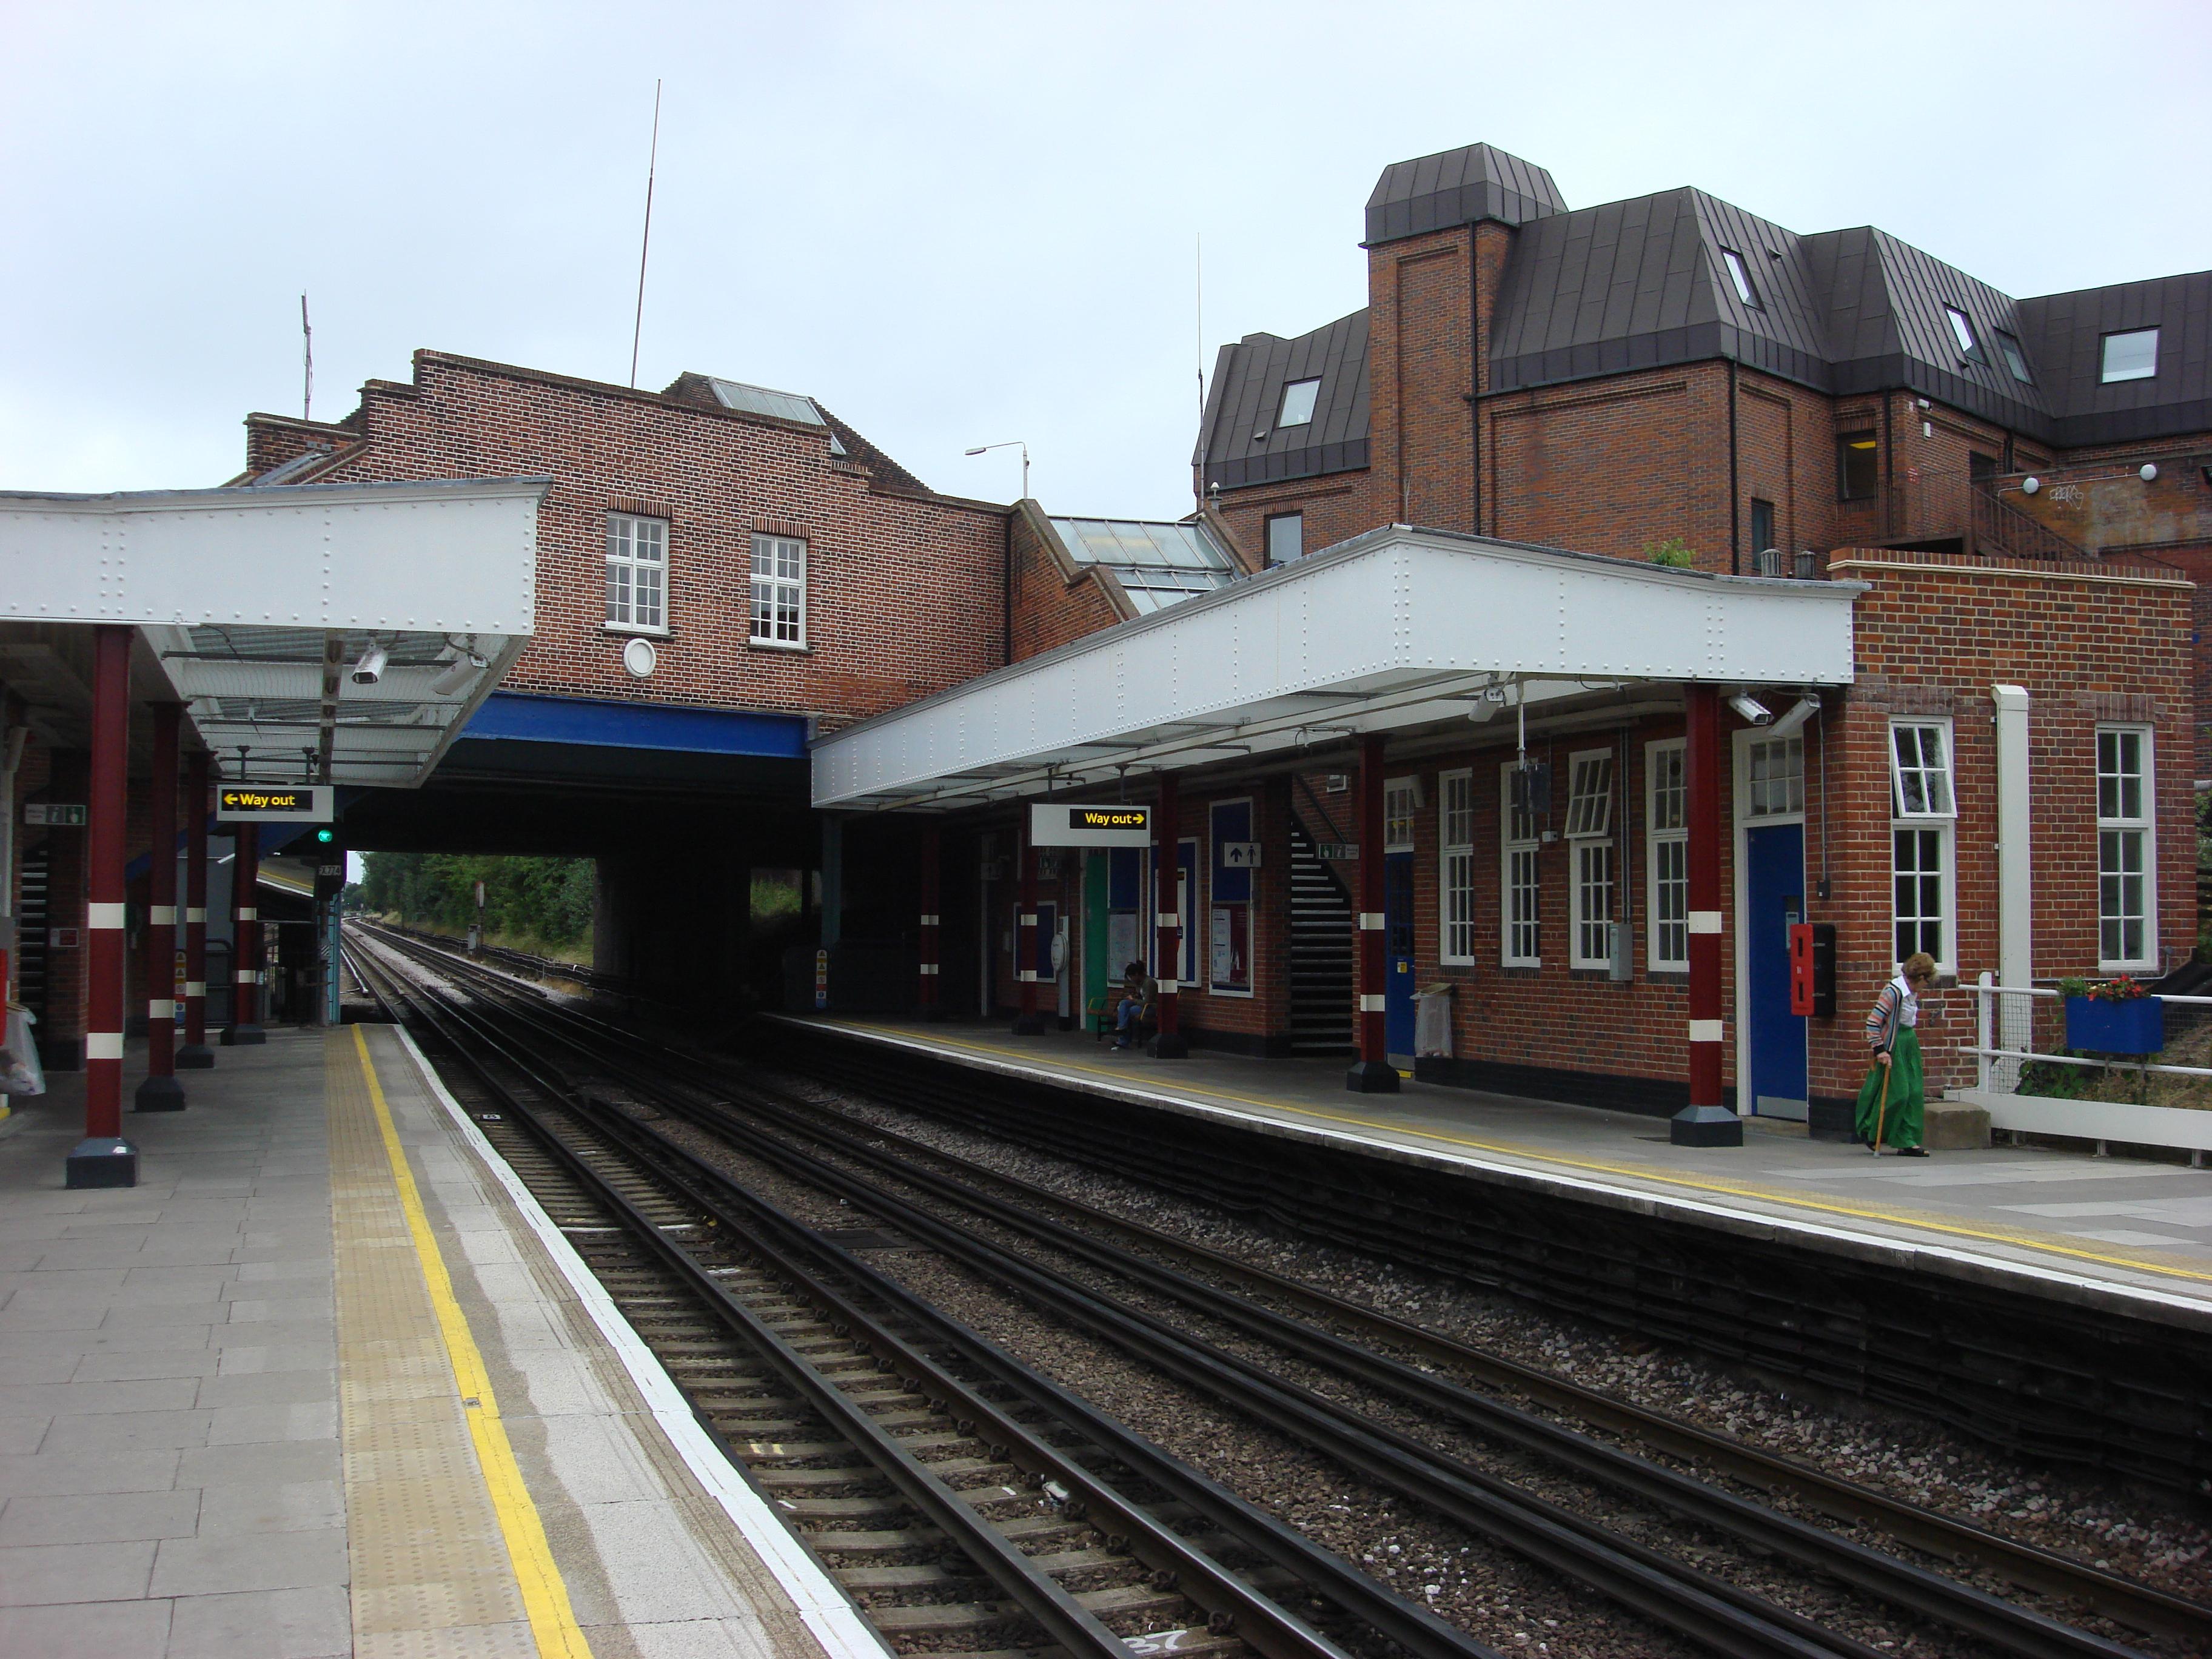 File:Northwood Hills northbound platform 2.jpg - Wikimedia Commons